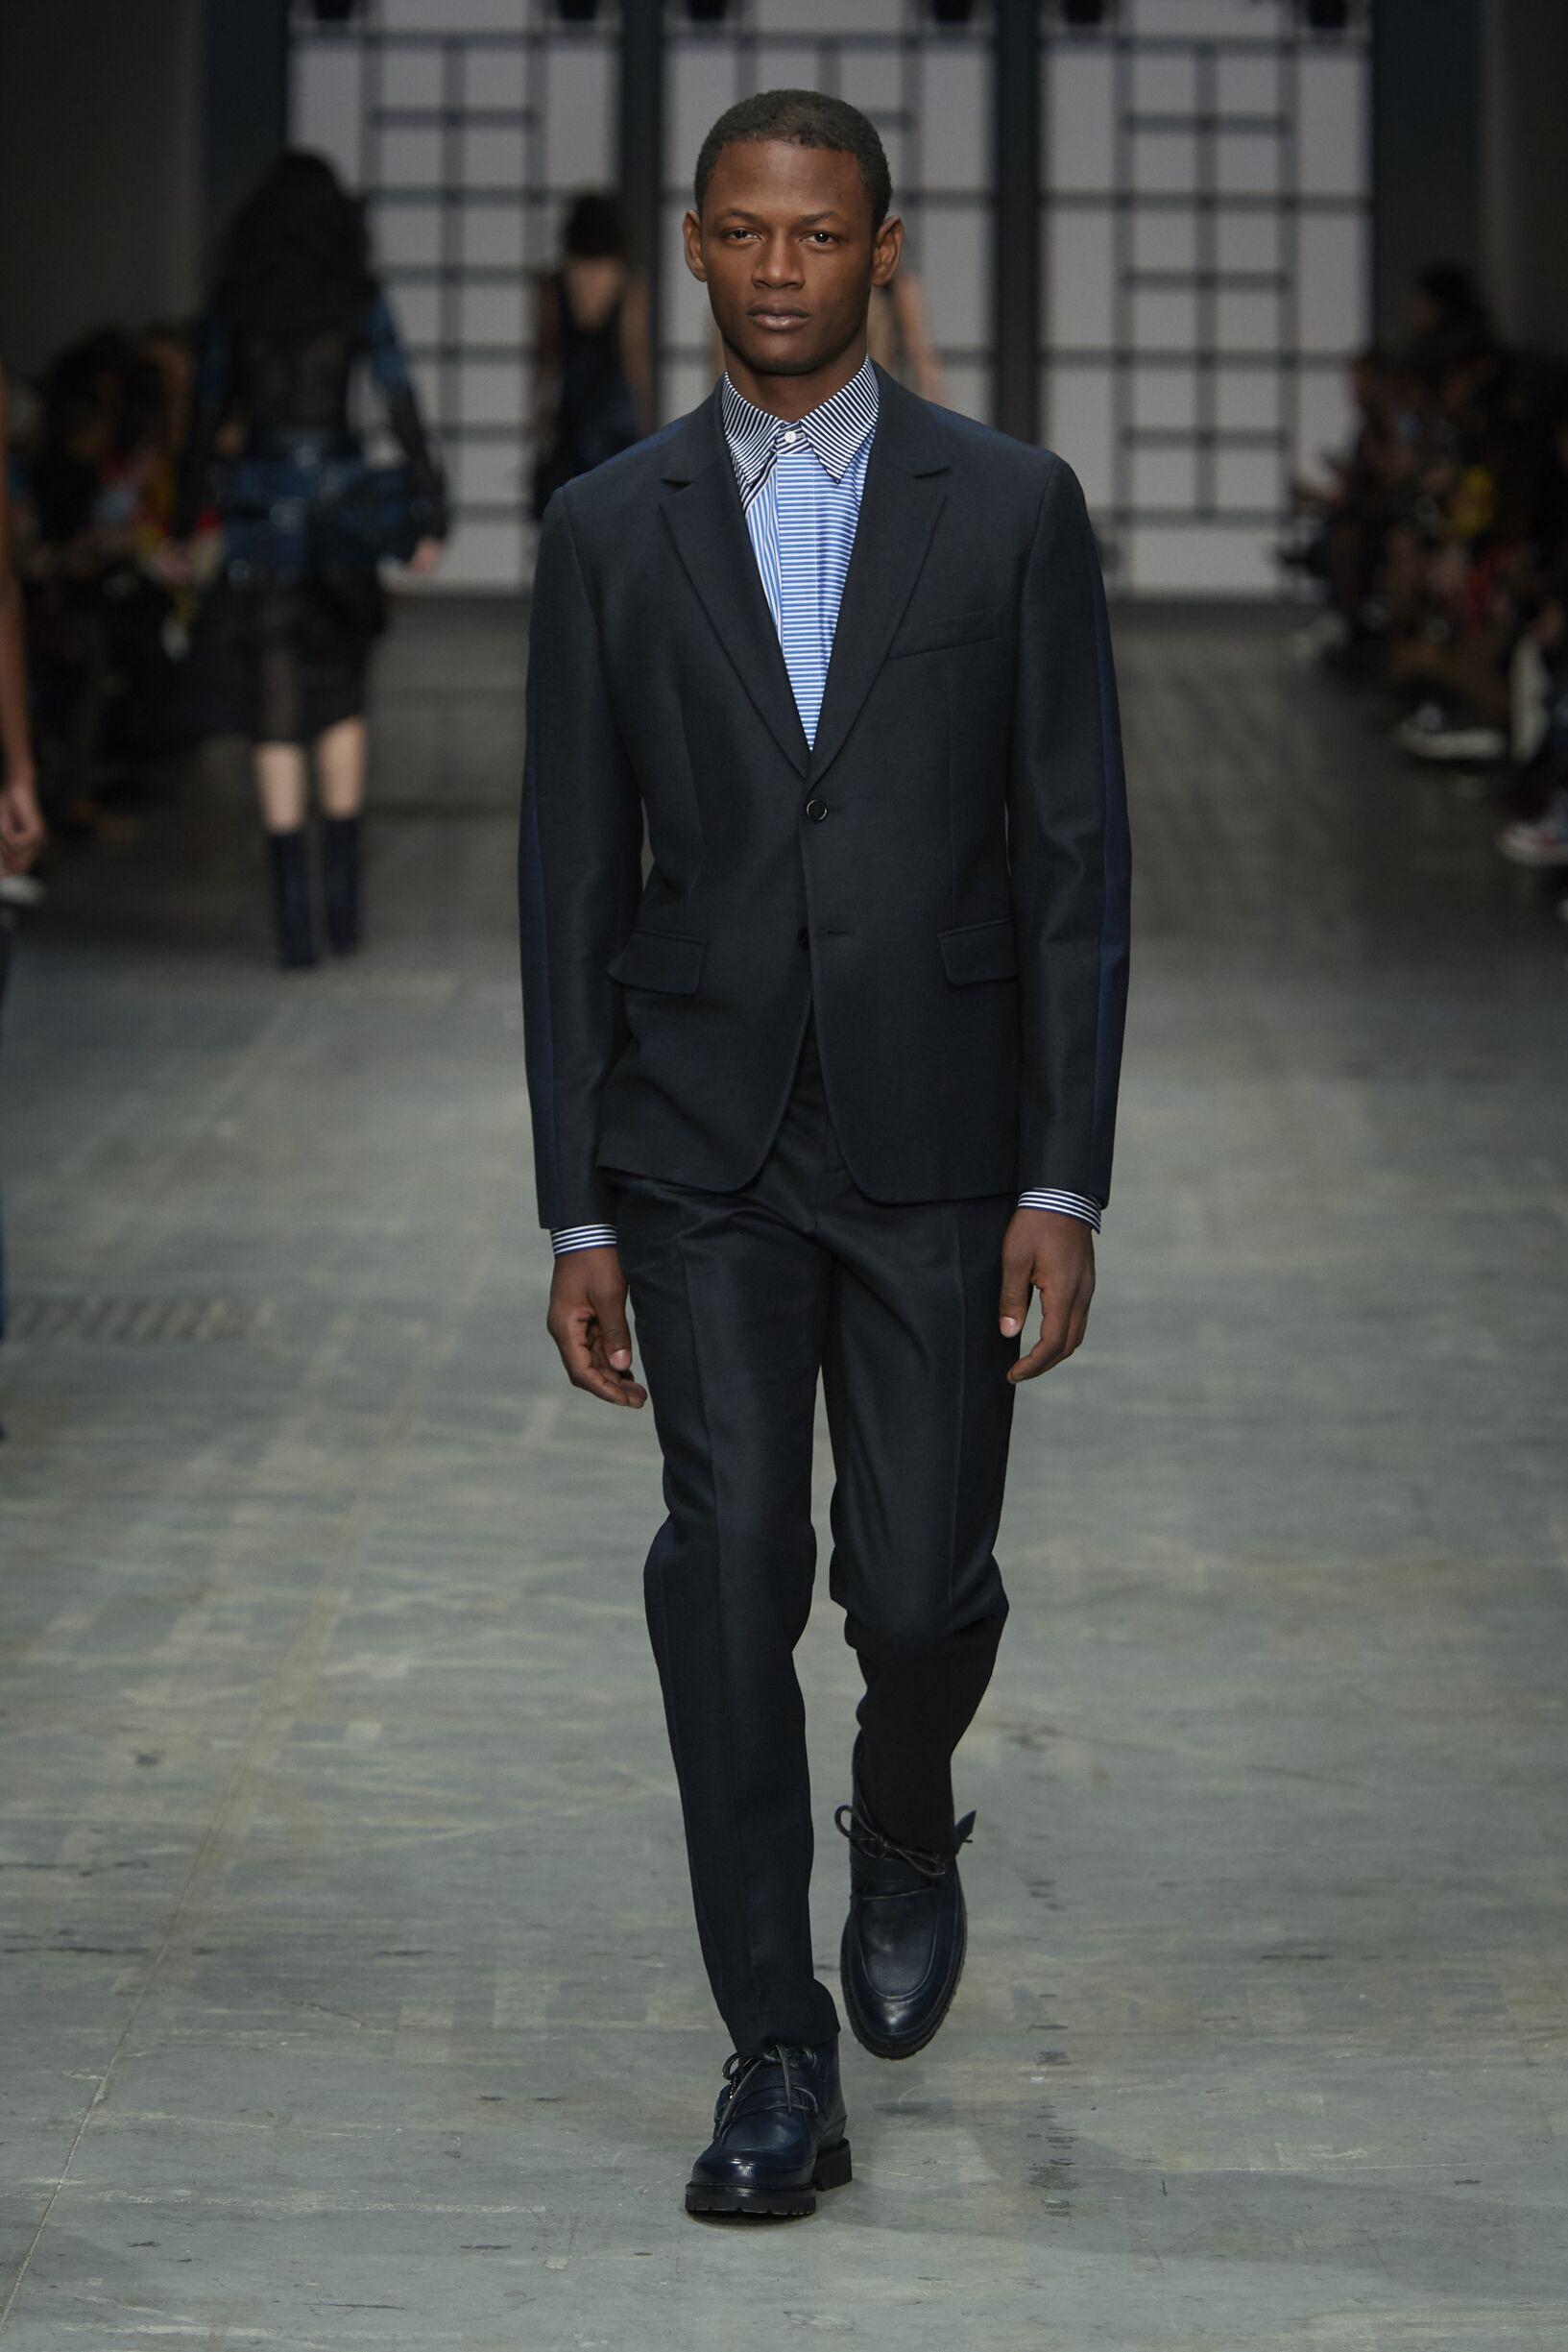 Suit FW 2018-19 Trussardi Fashion Show Milan